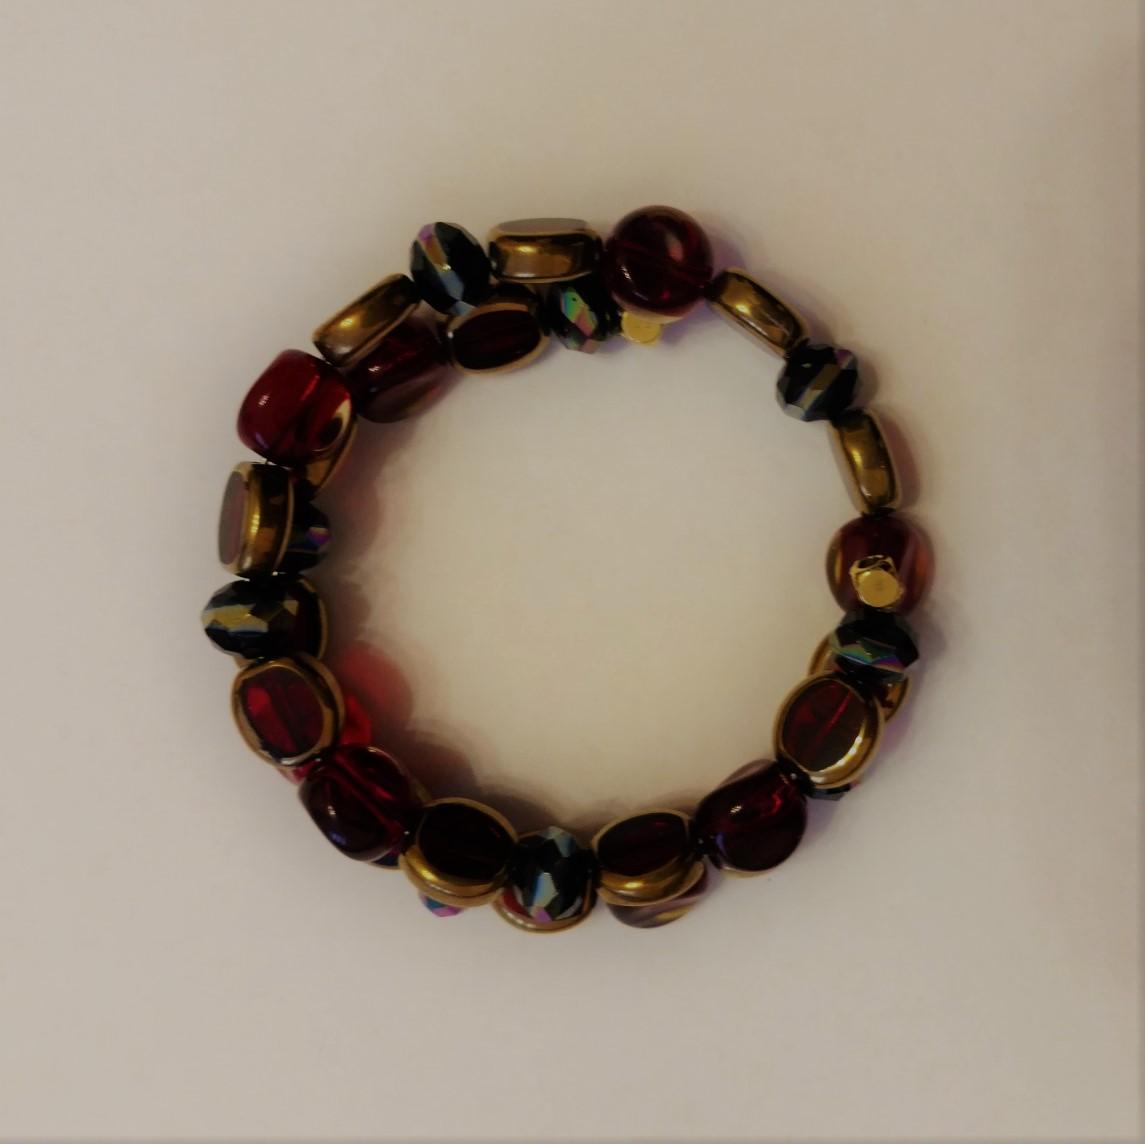 #L&L 181203 Bracelet  Suggested $18 USD - SOLD